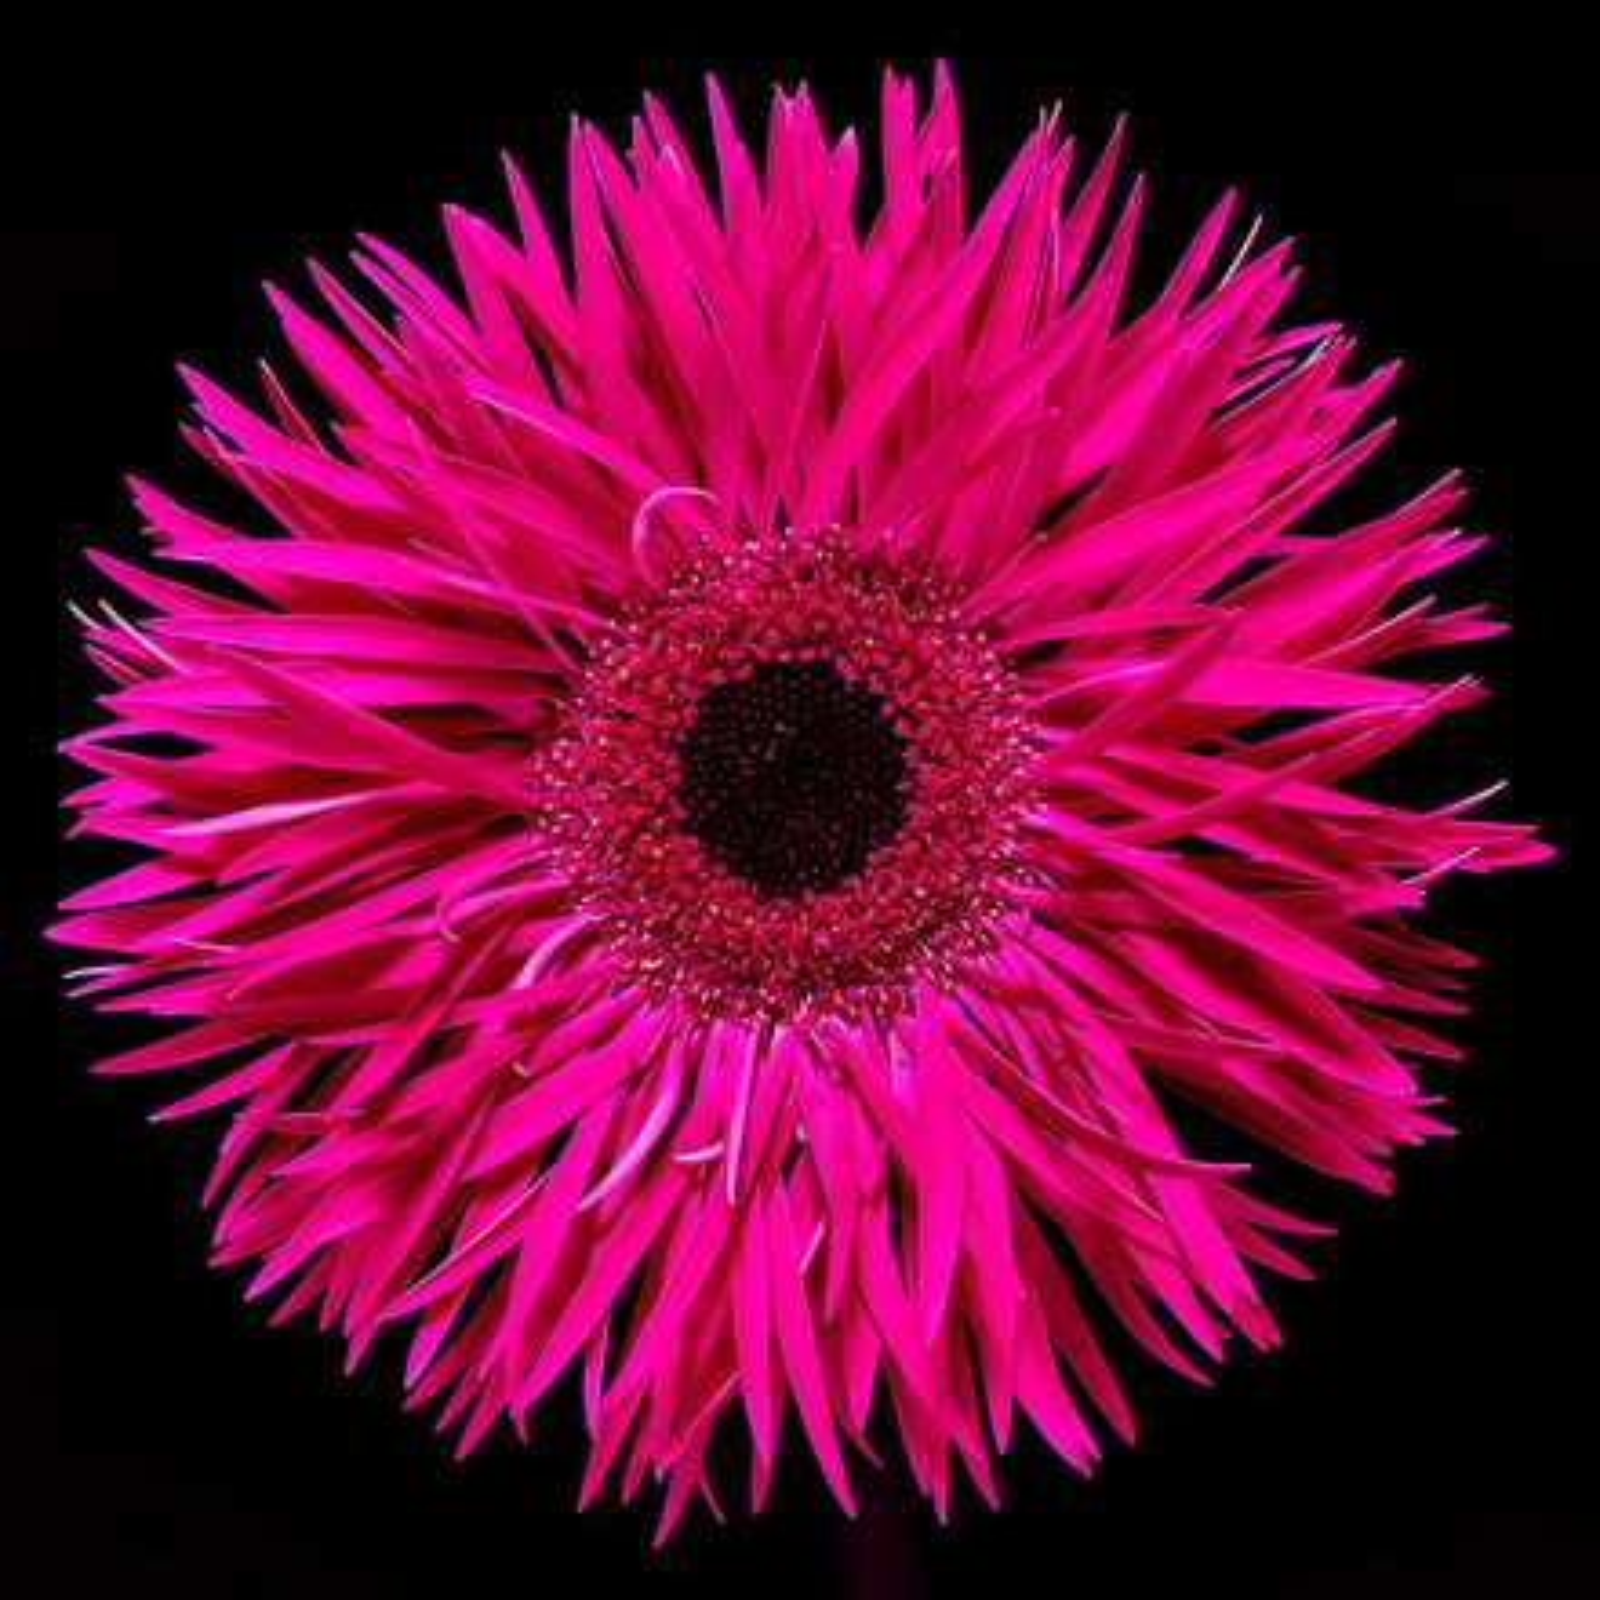 Blossom III - Heiko Hellwig